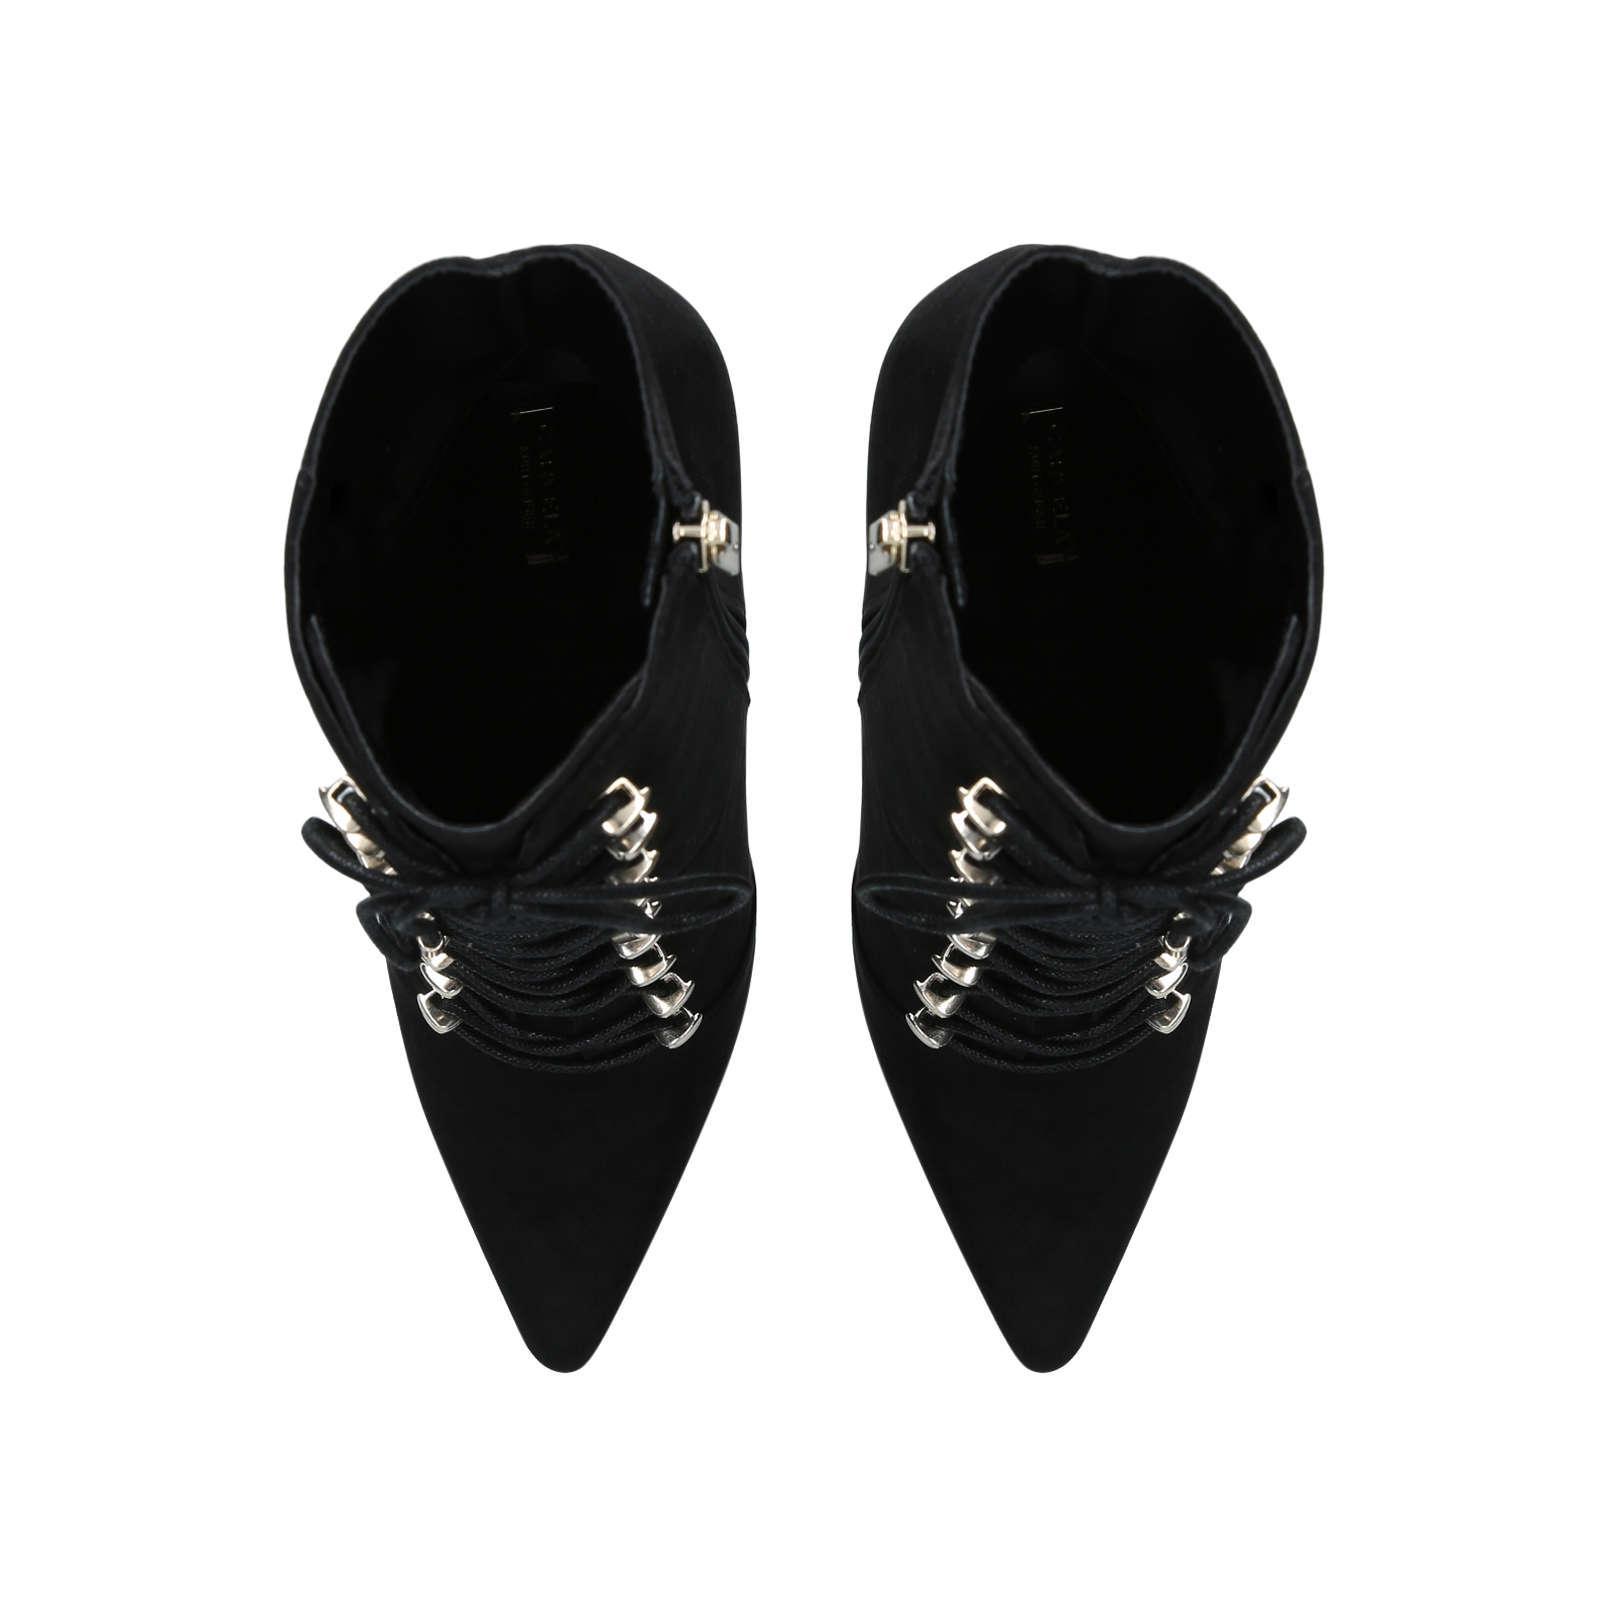 Carvela Kurt Geiger Denim 'stephanie' Suedette Lace Up Ankle Boots in Black